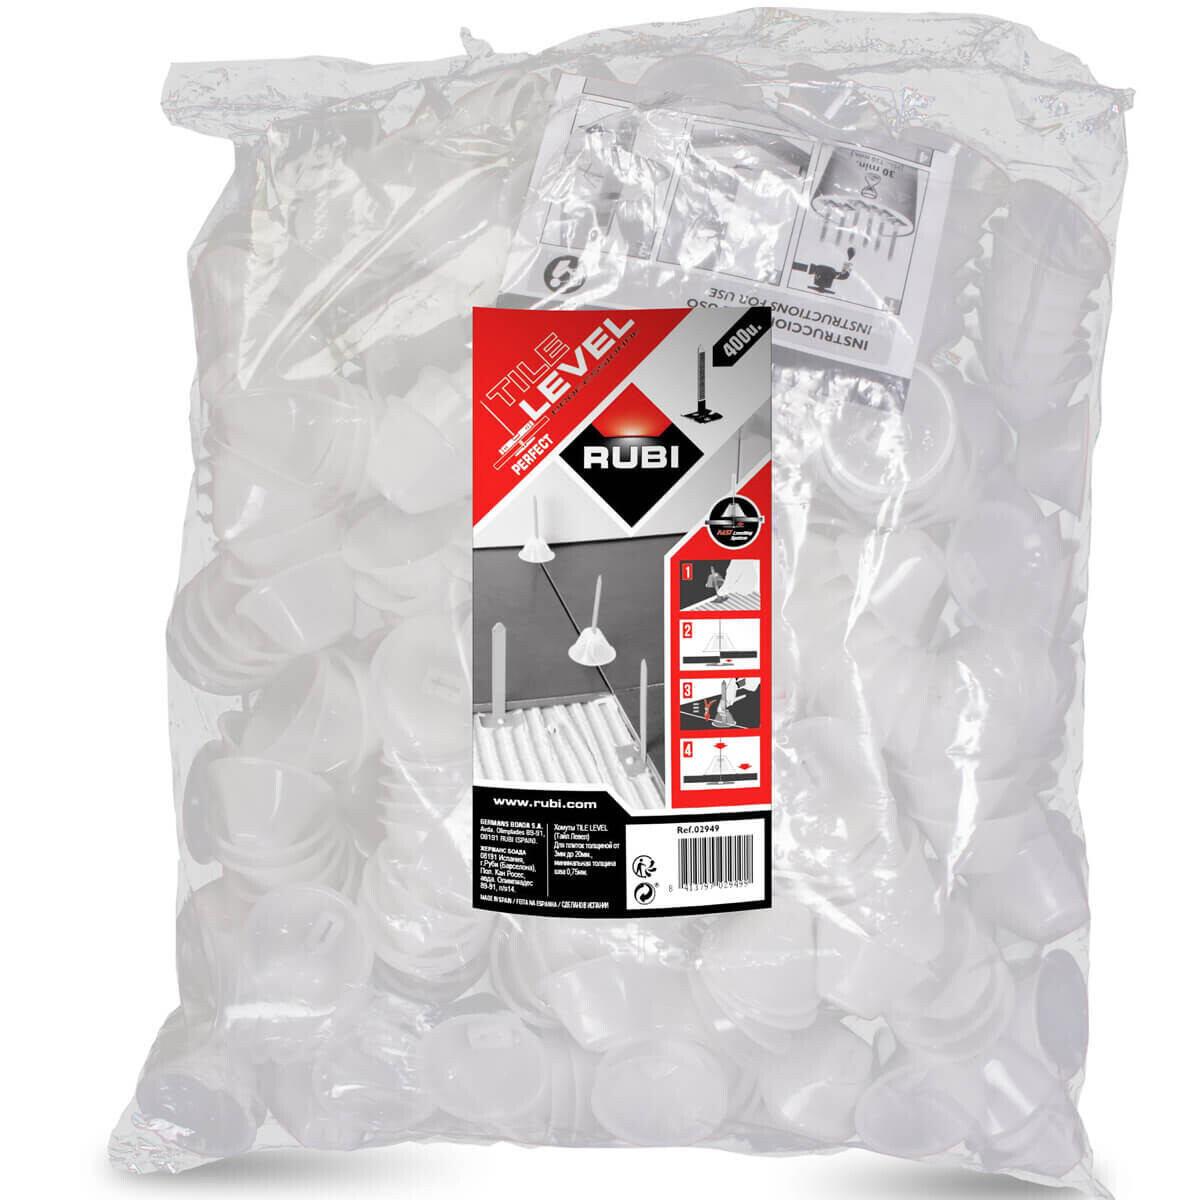 02980 rubi tools caps bag, easy ceramic tile or stone tile installation lippage free